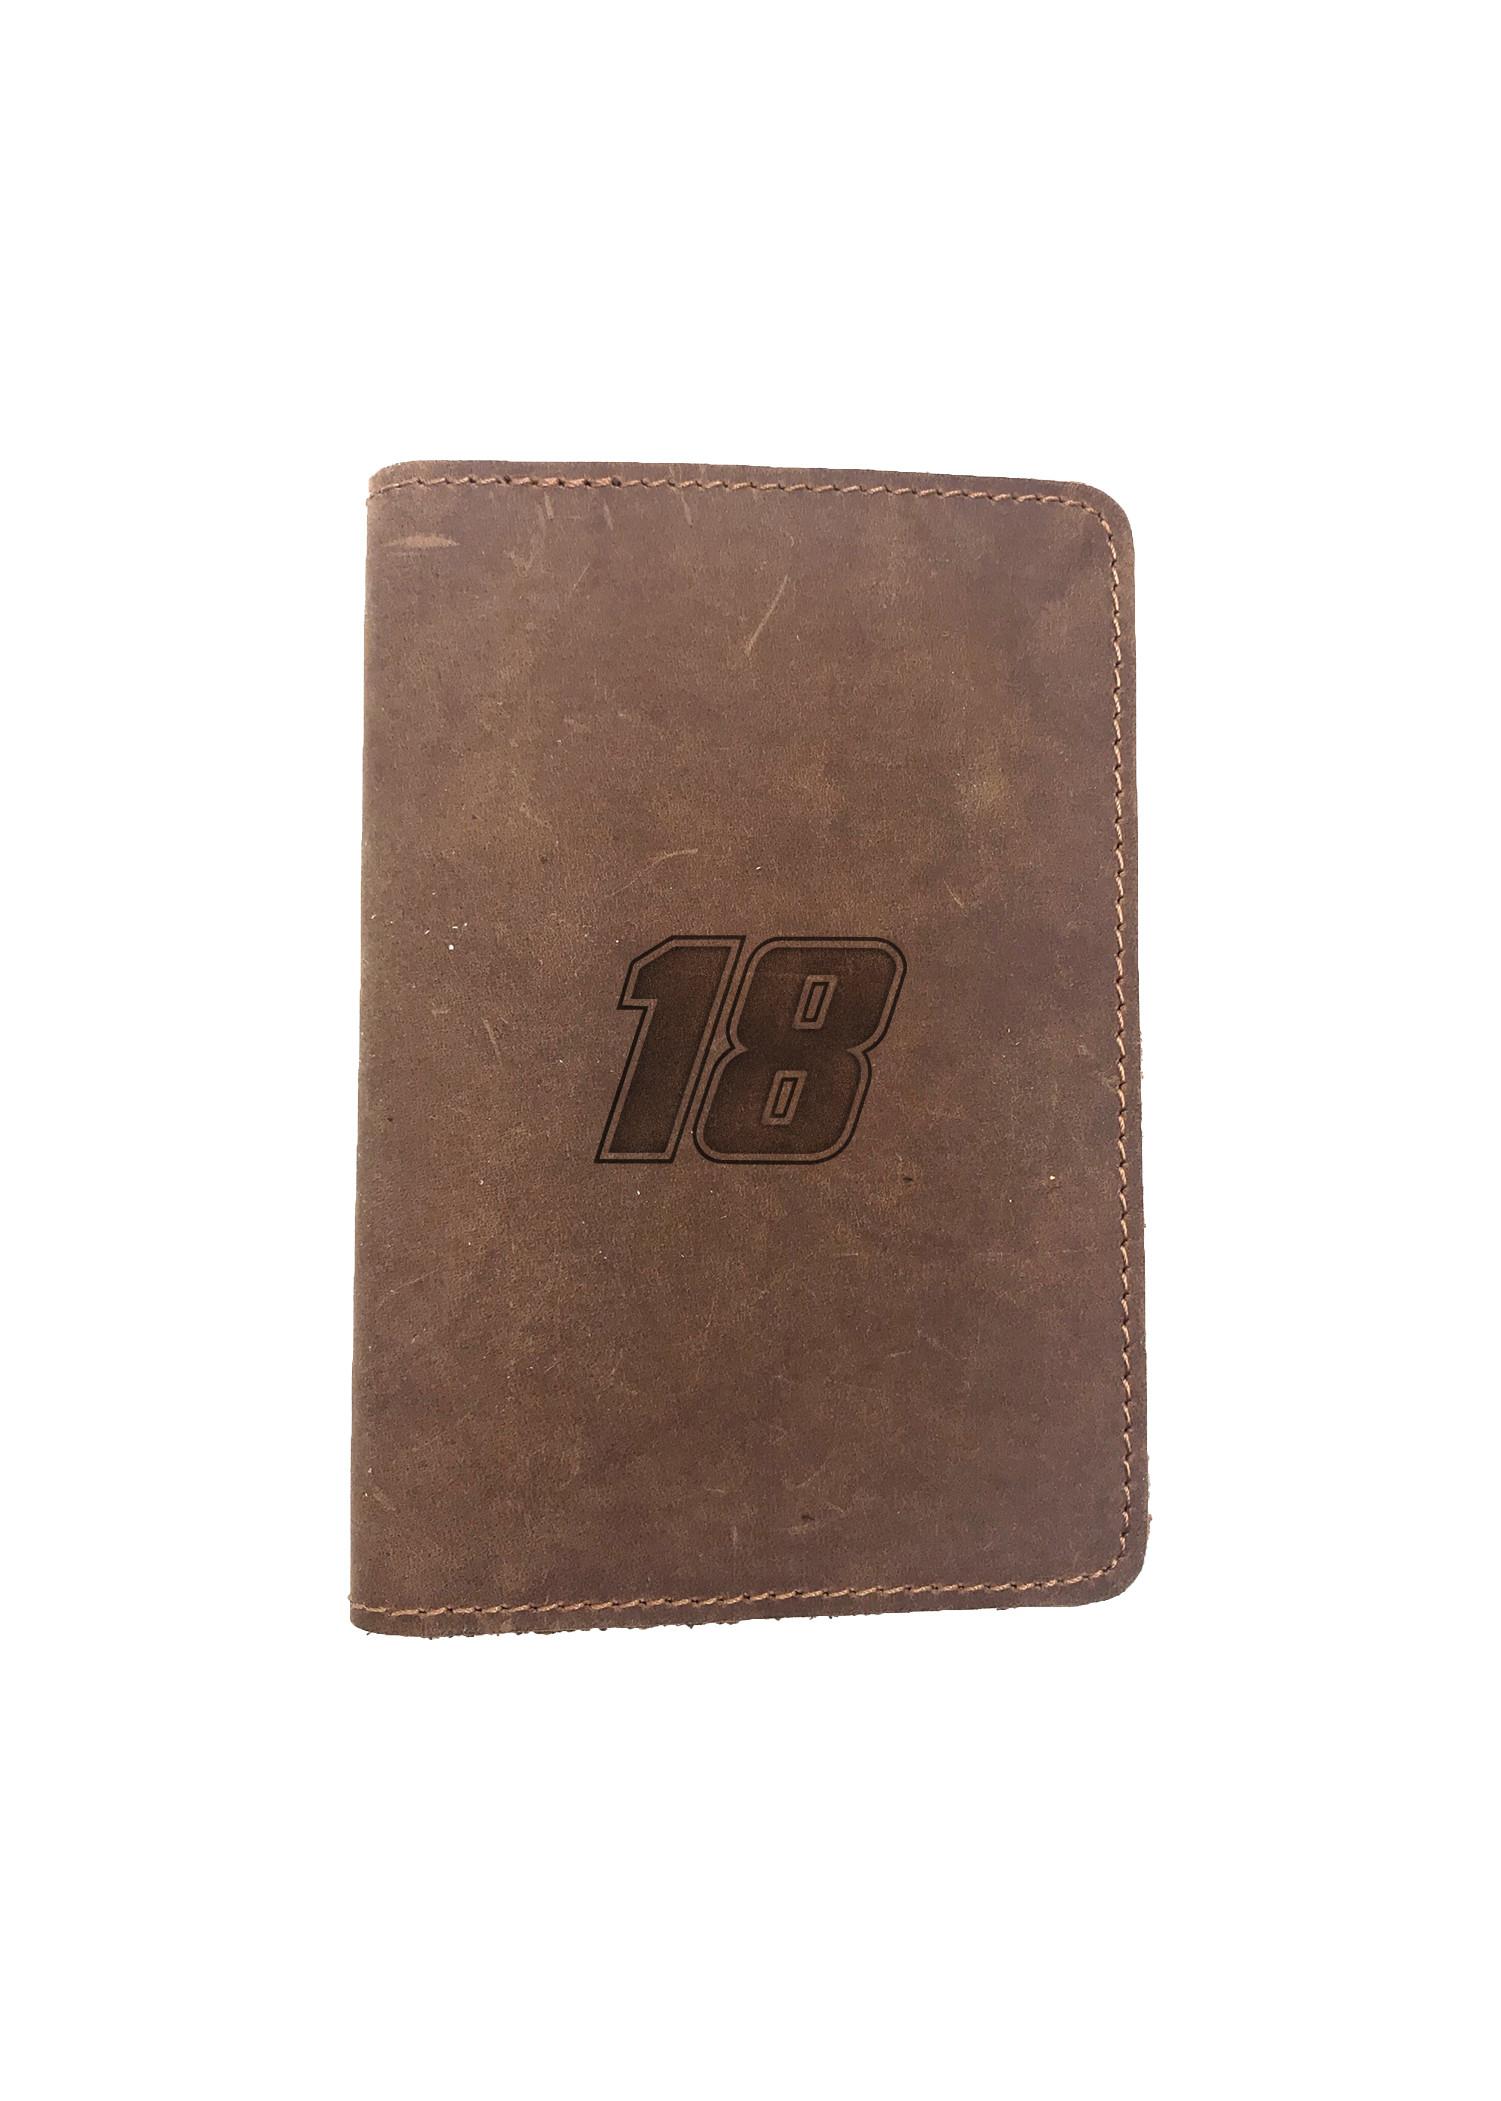 Passport Cover Bao Da Hộ Chiếu Da Sáp Khắc Hình Số 18 NASCAR (BROWN)